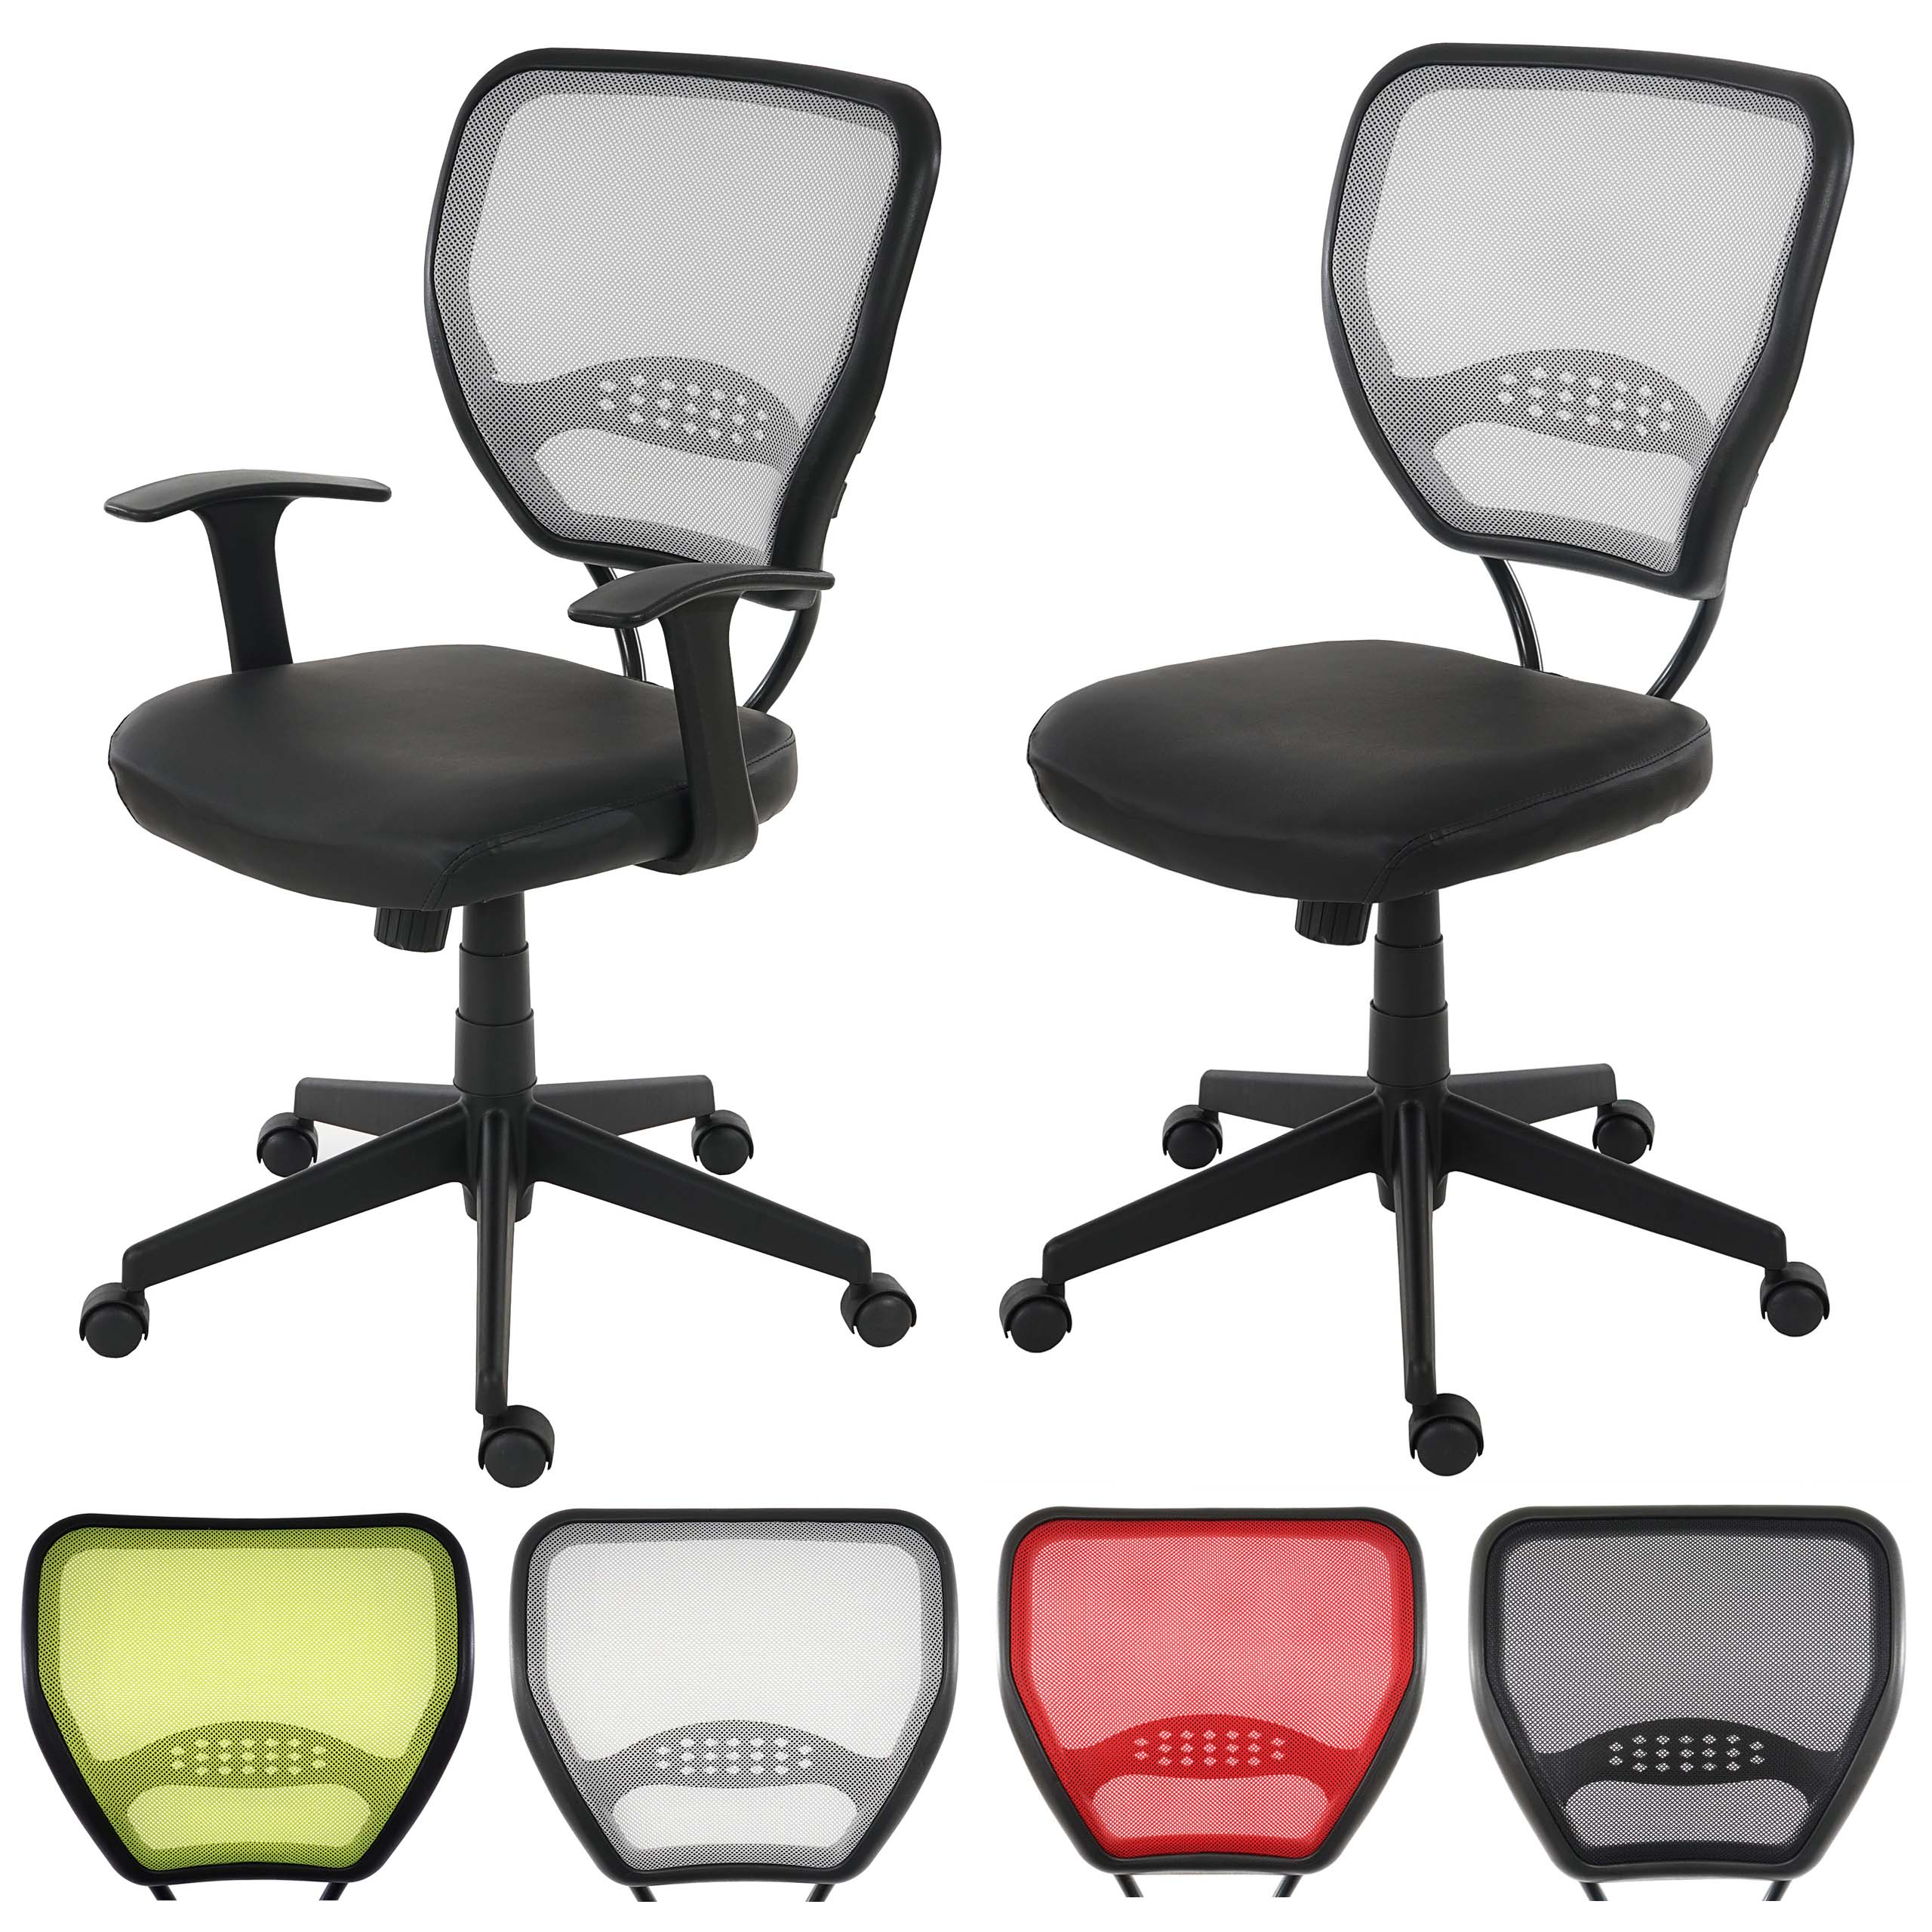 Profi-Bürostuhl Seattle, Chefsessel Drehstuhl, 150kg belastbar, Textil ~ Variantenangebot